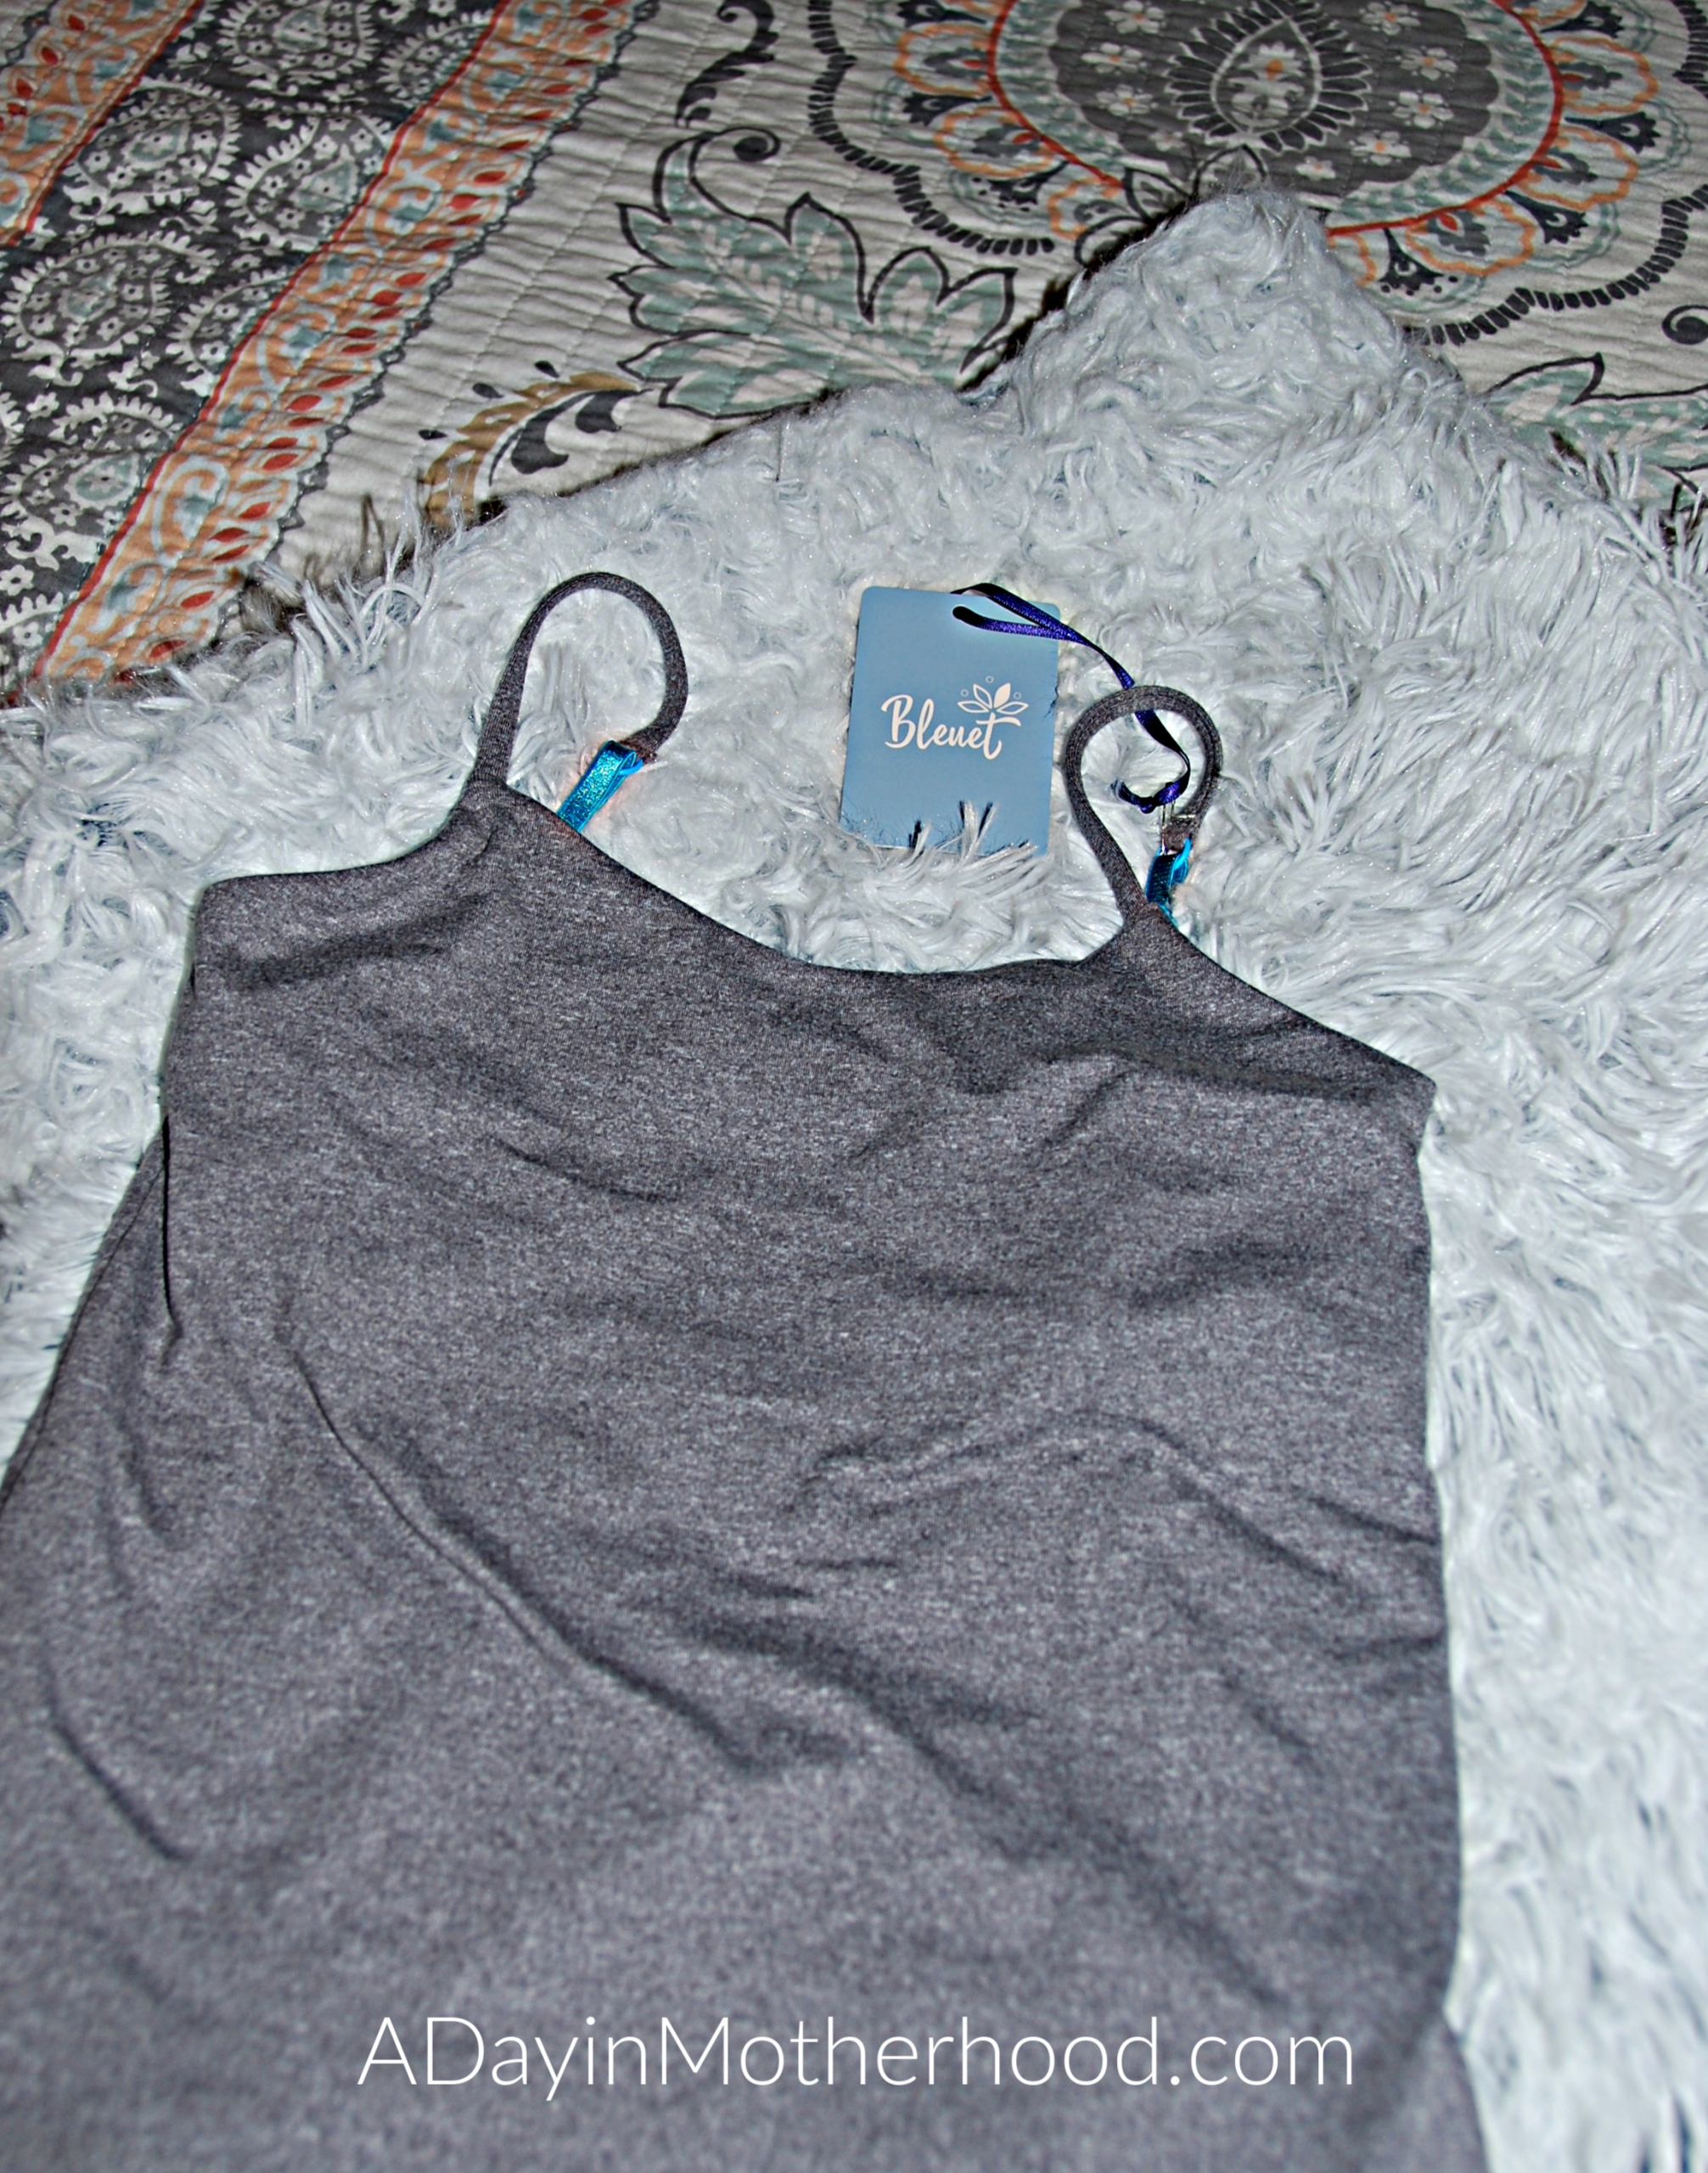 Bleuet-A Better Bra for Tweens and Teens-photo of a grey cami on ADayinMotherhood.com